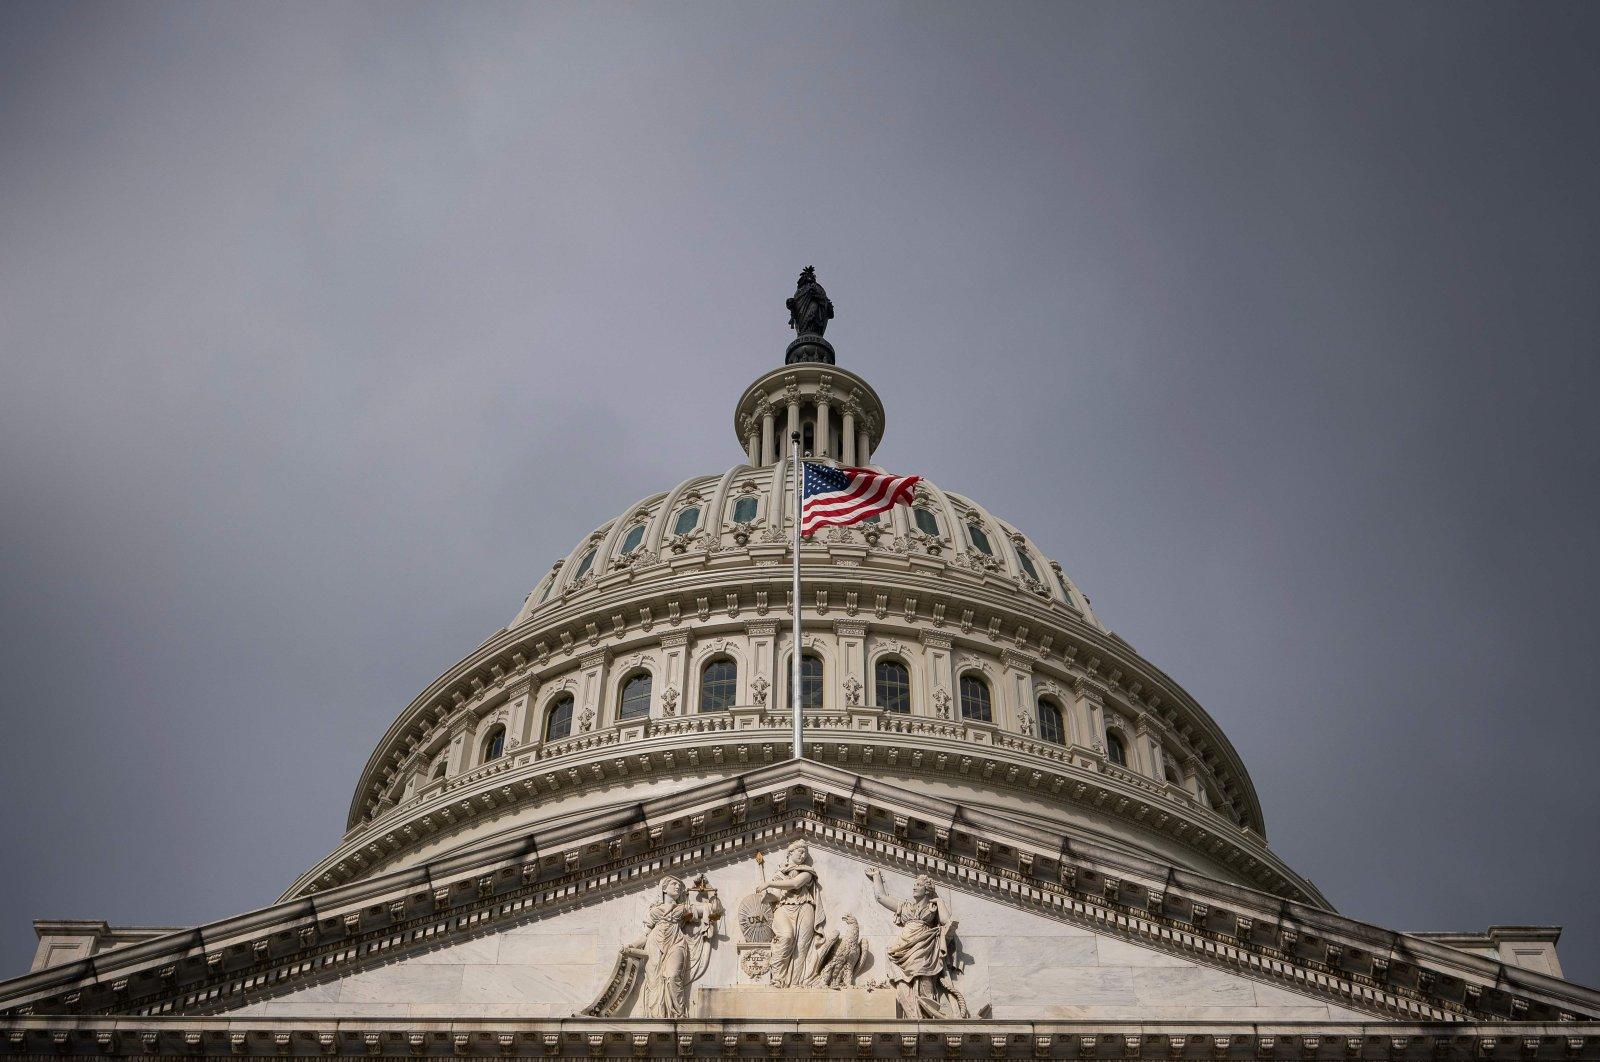 The U.S. Capitol in Washington, D.C., Thursday, March 26, 2020. (AFP Photo)